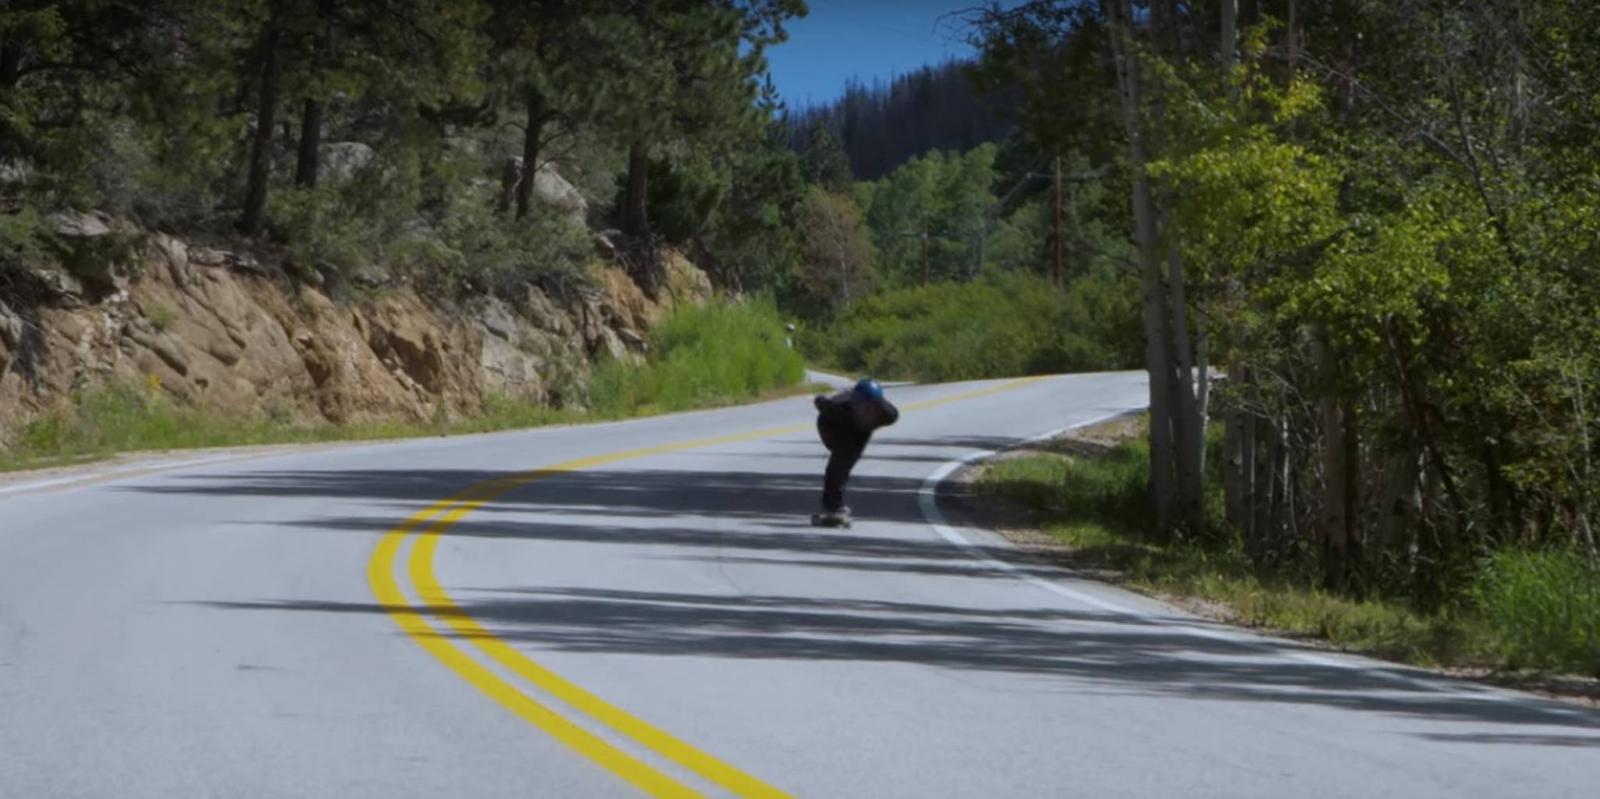 Kyle Wester skateboard record